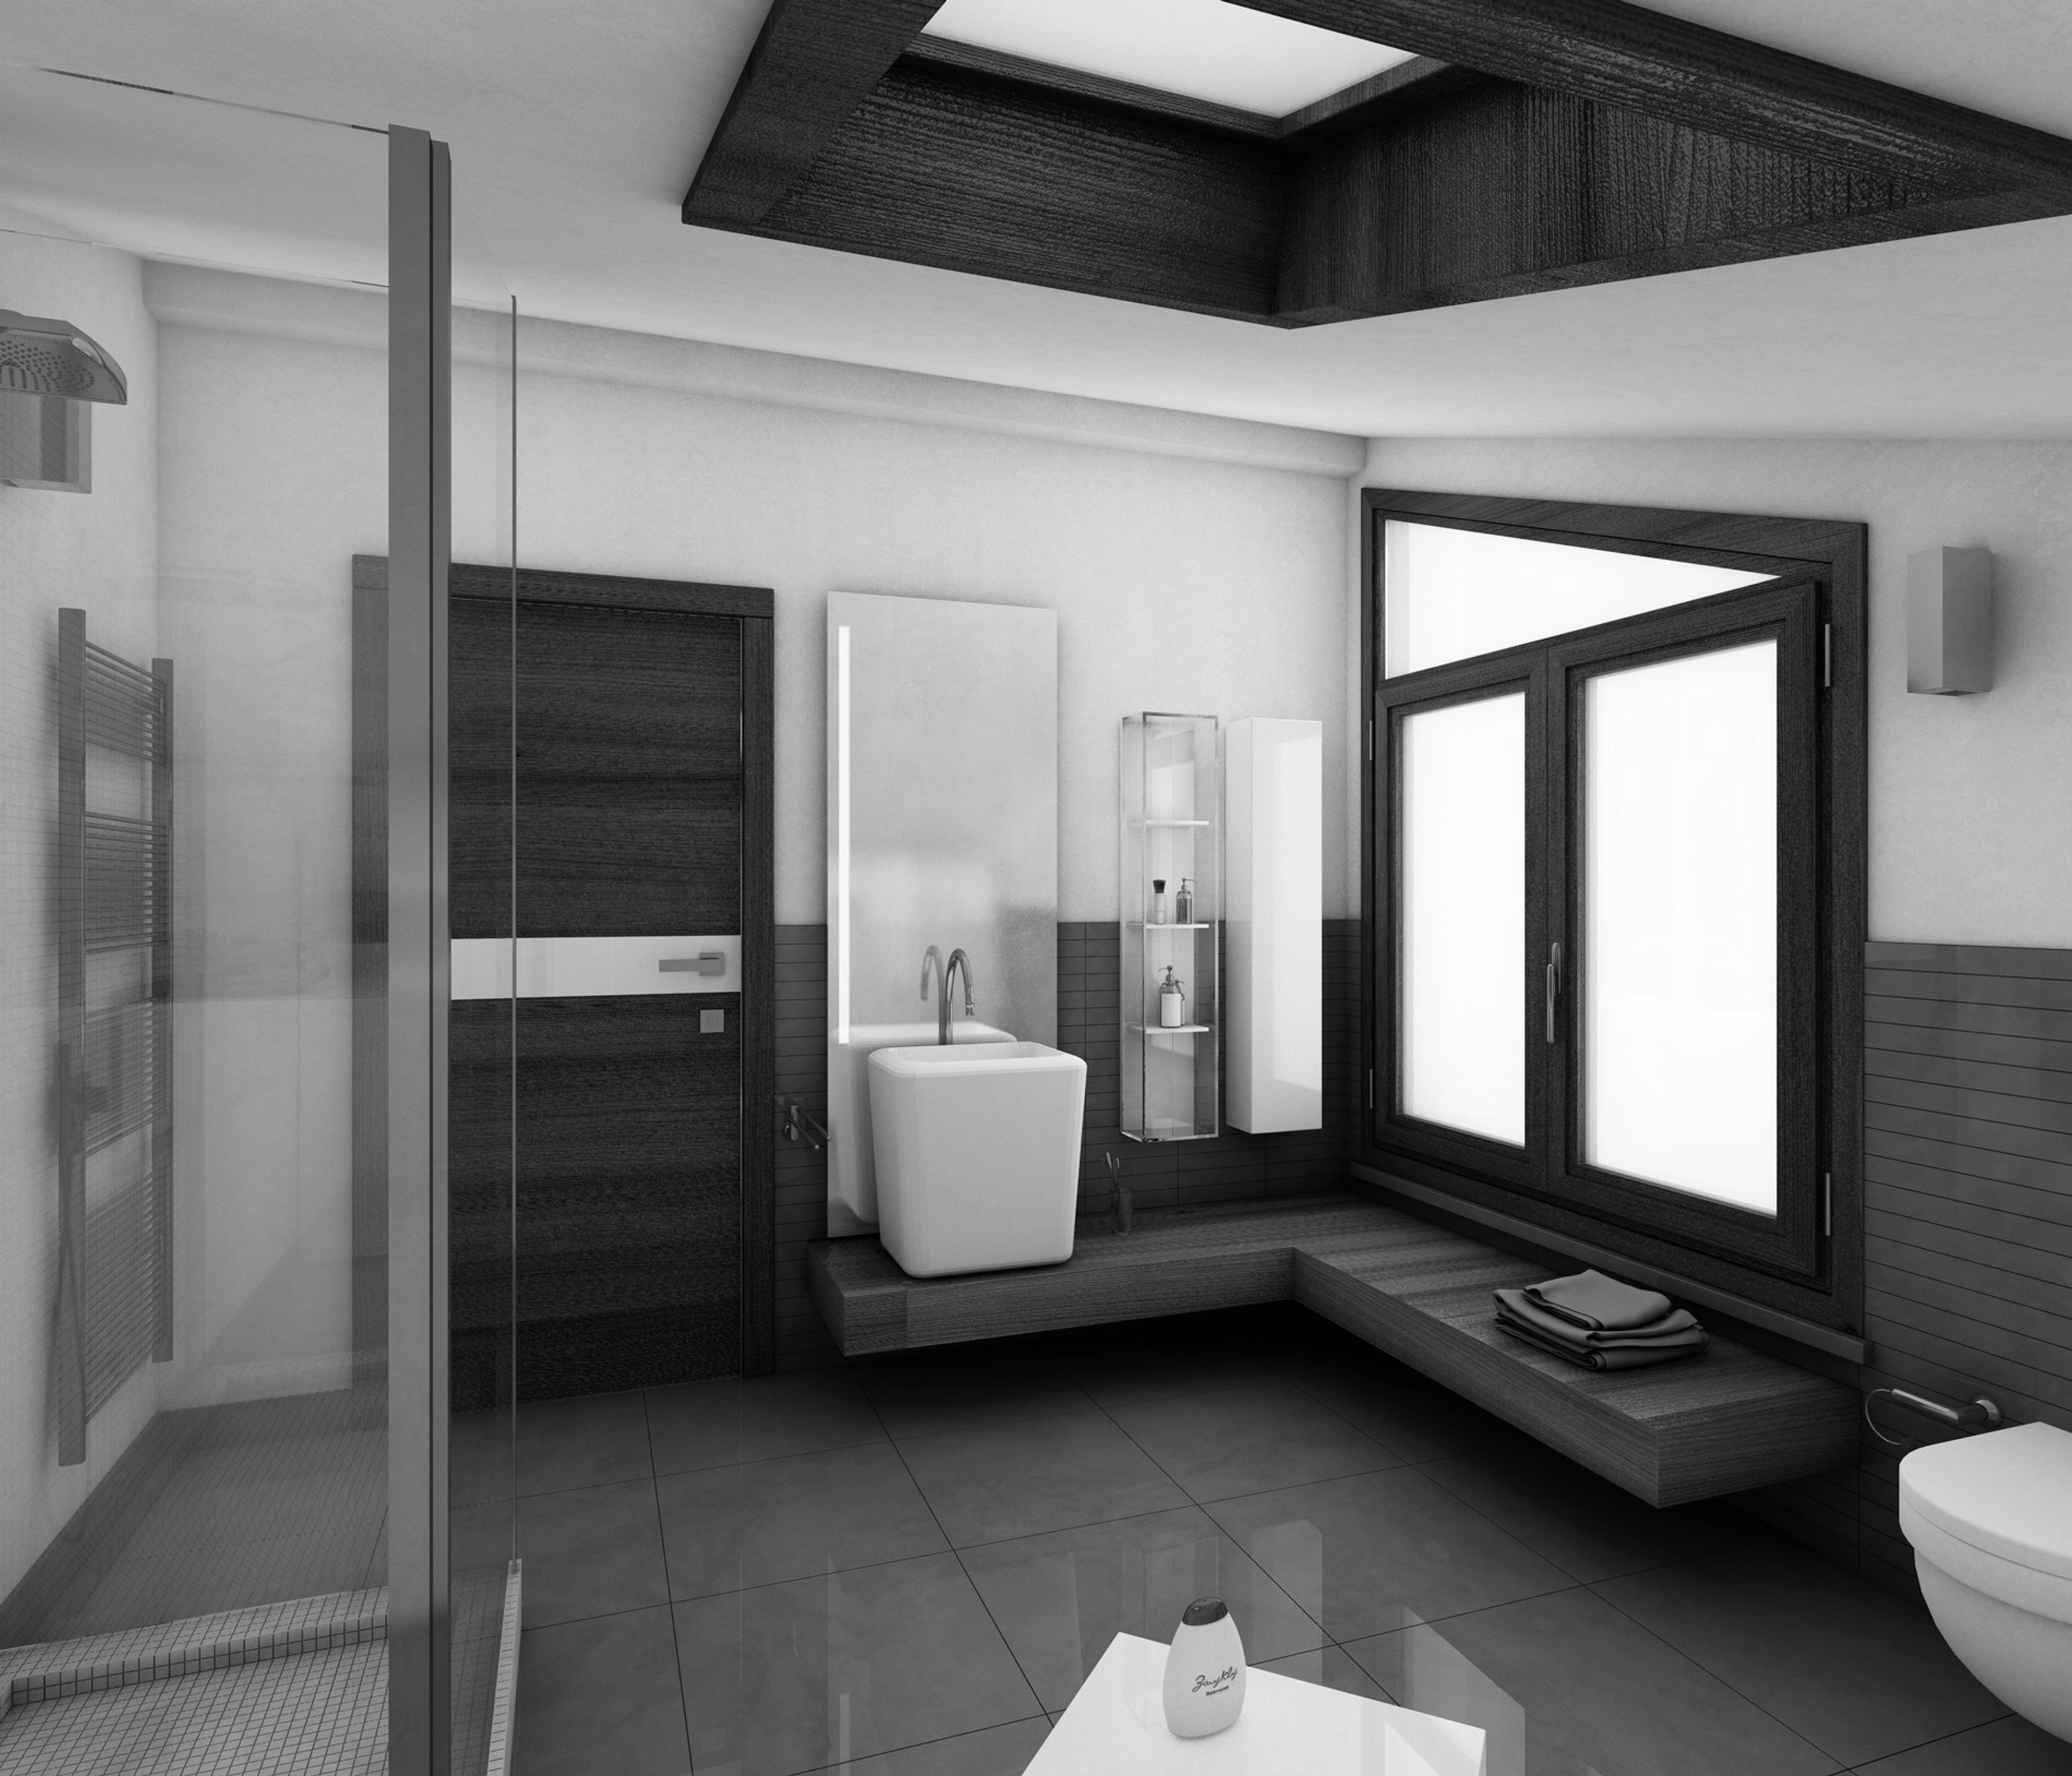 Mobili stile moderno sottoscale mobili moderni in noce for Mobili stile moderno